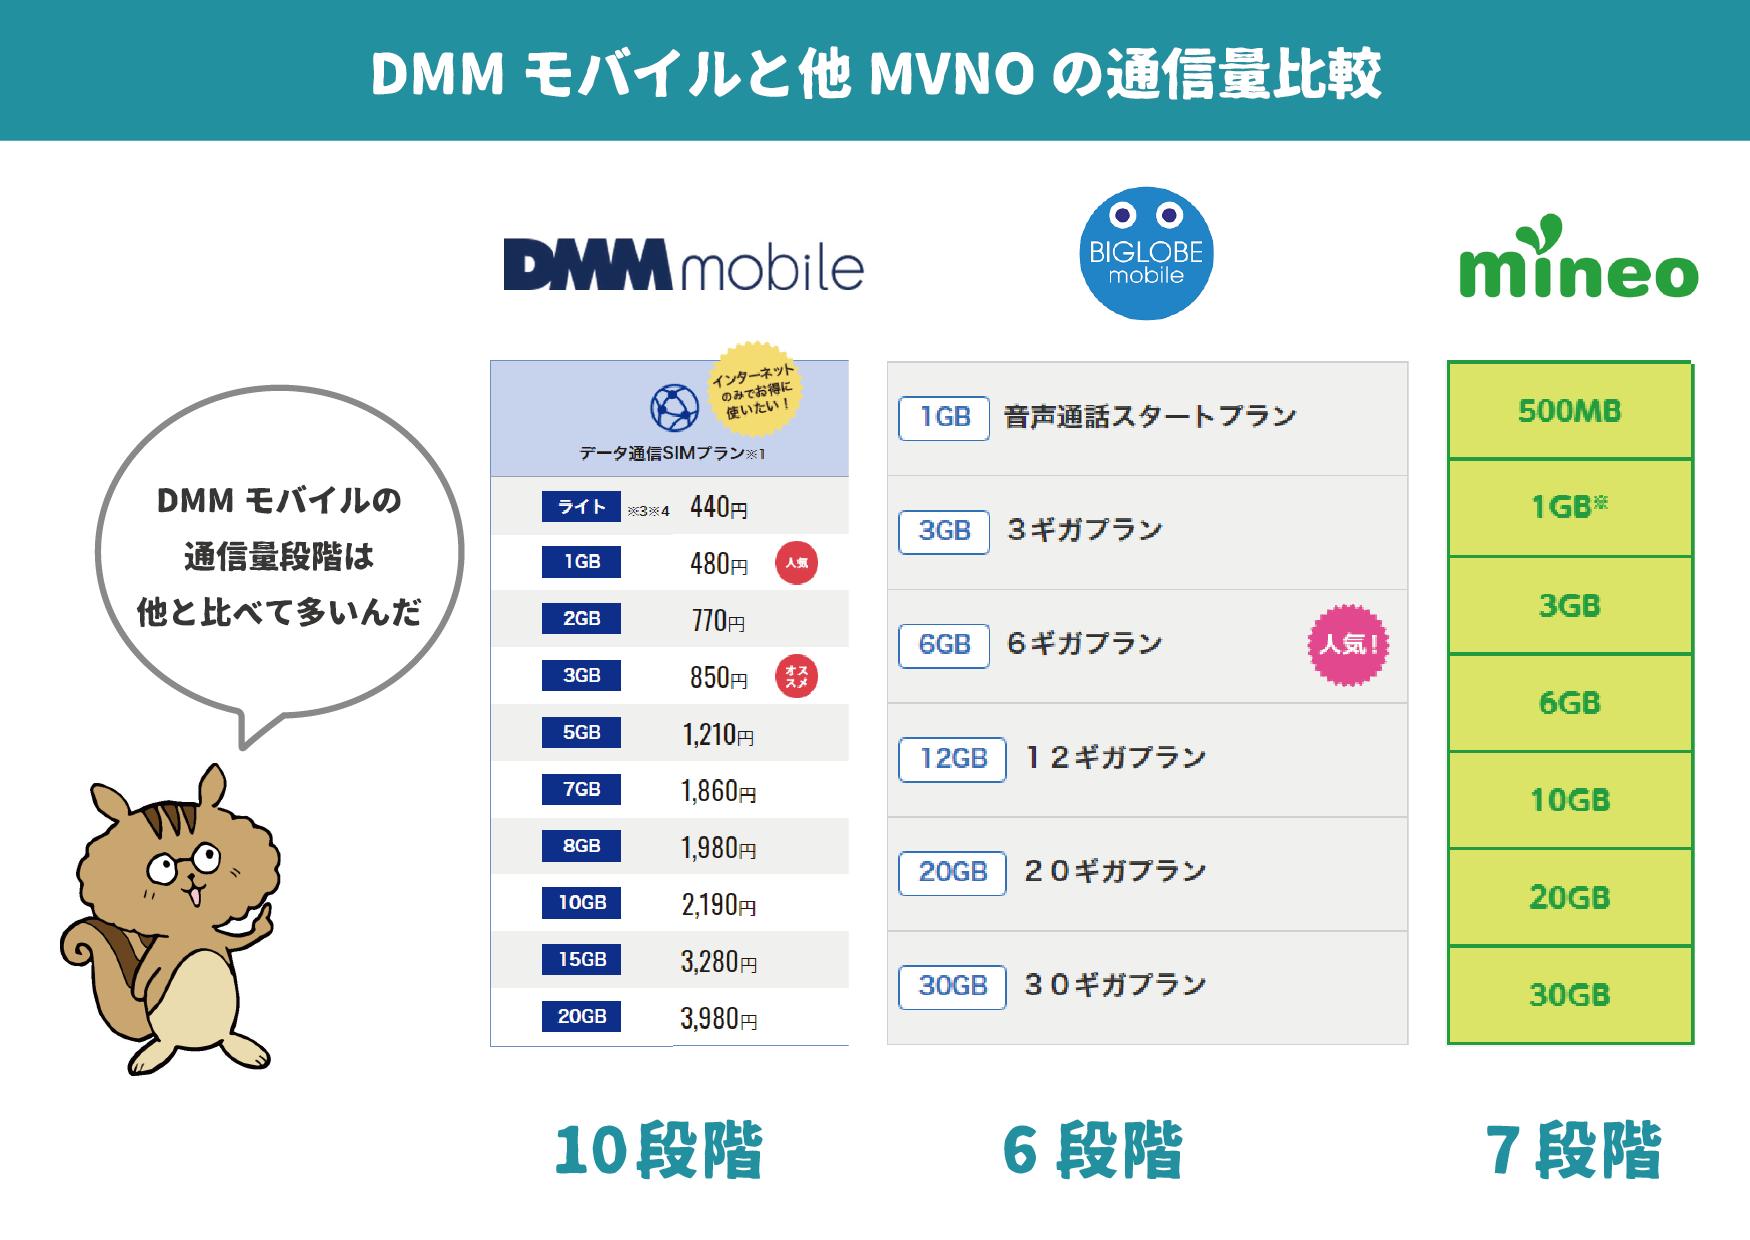 DMMモバイルと他MVNOの料金比較